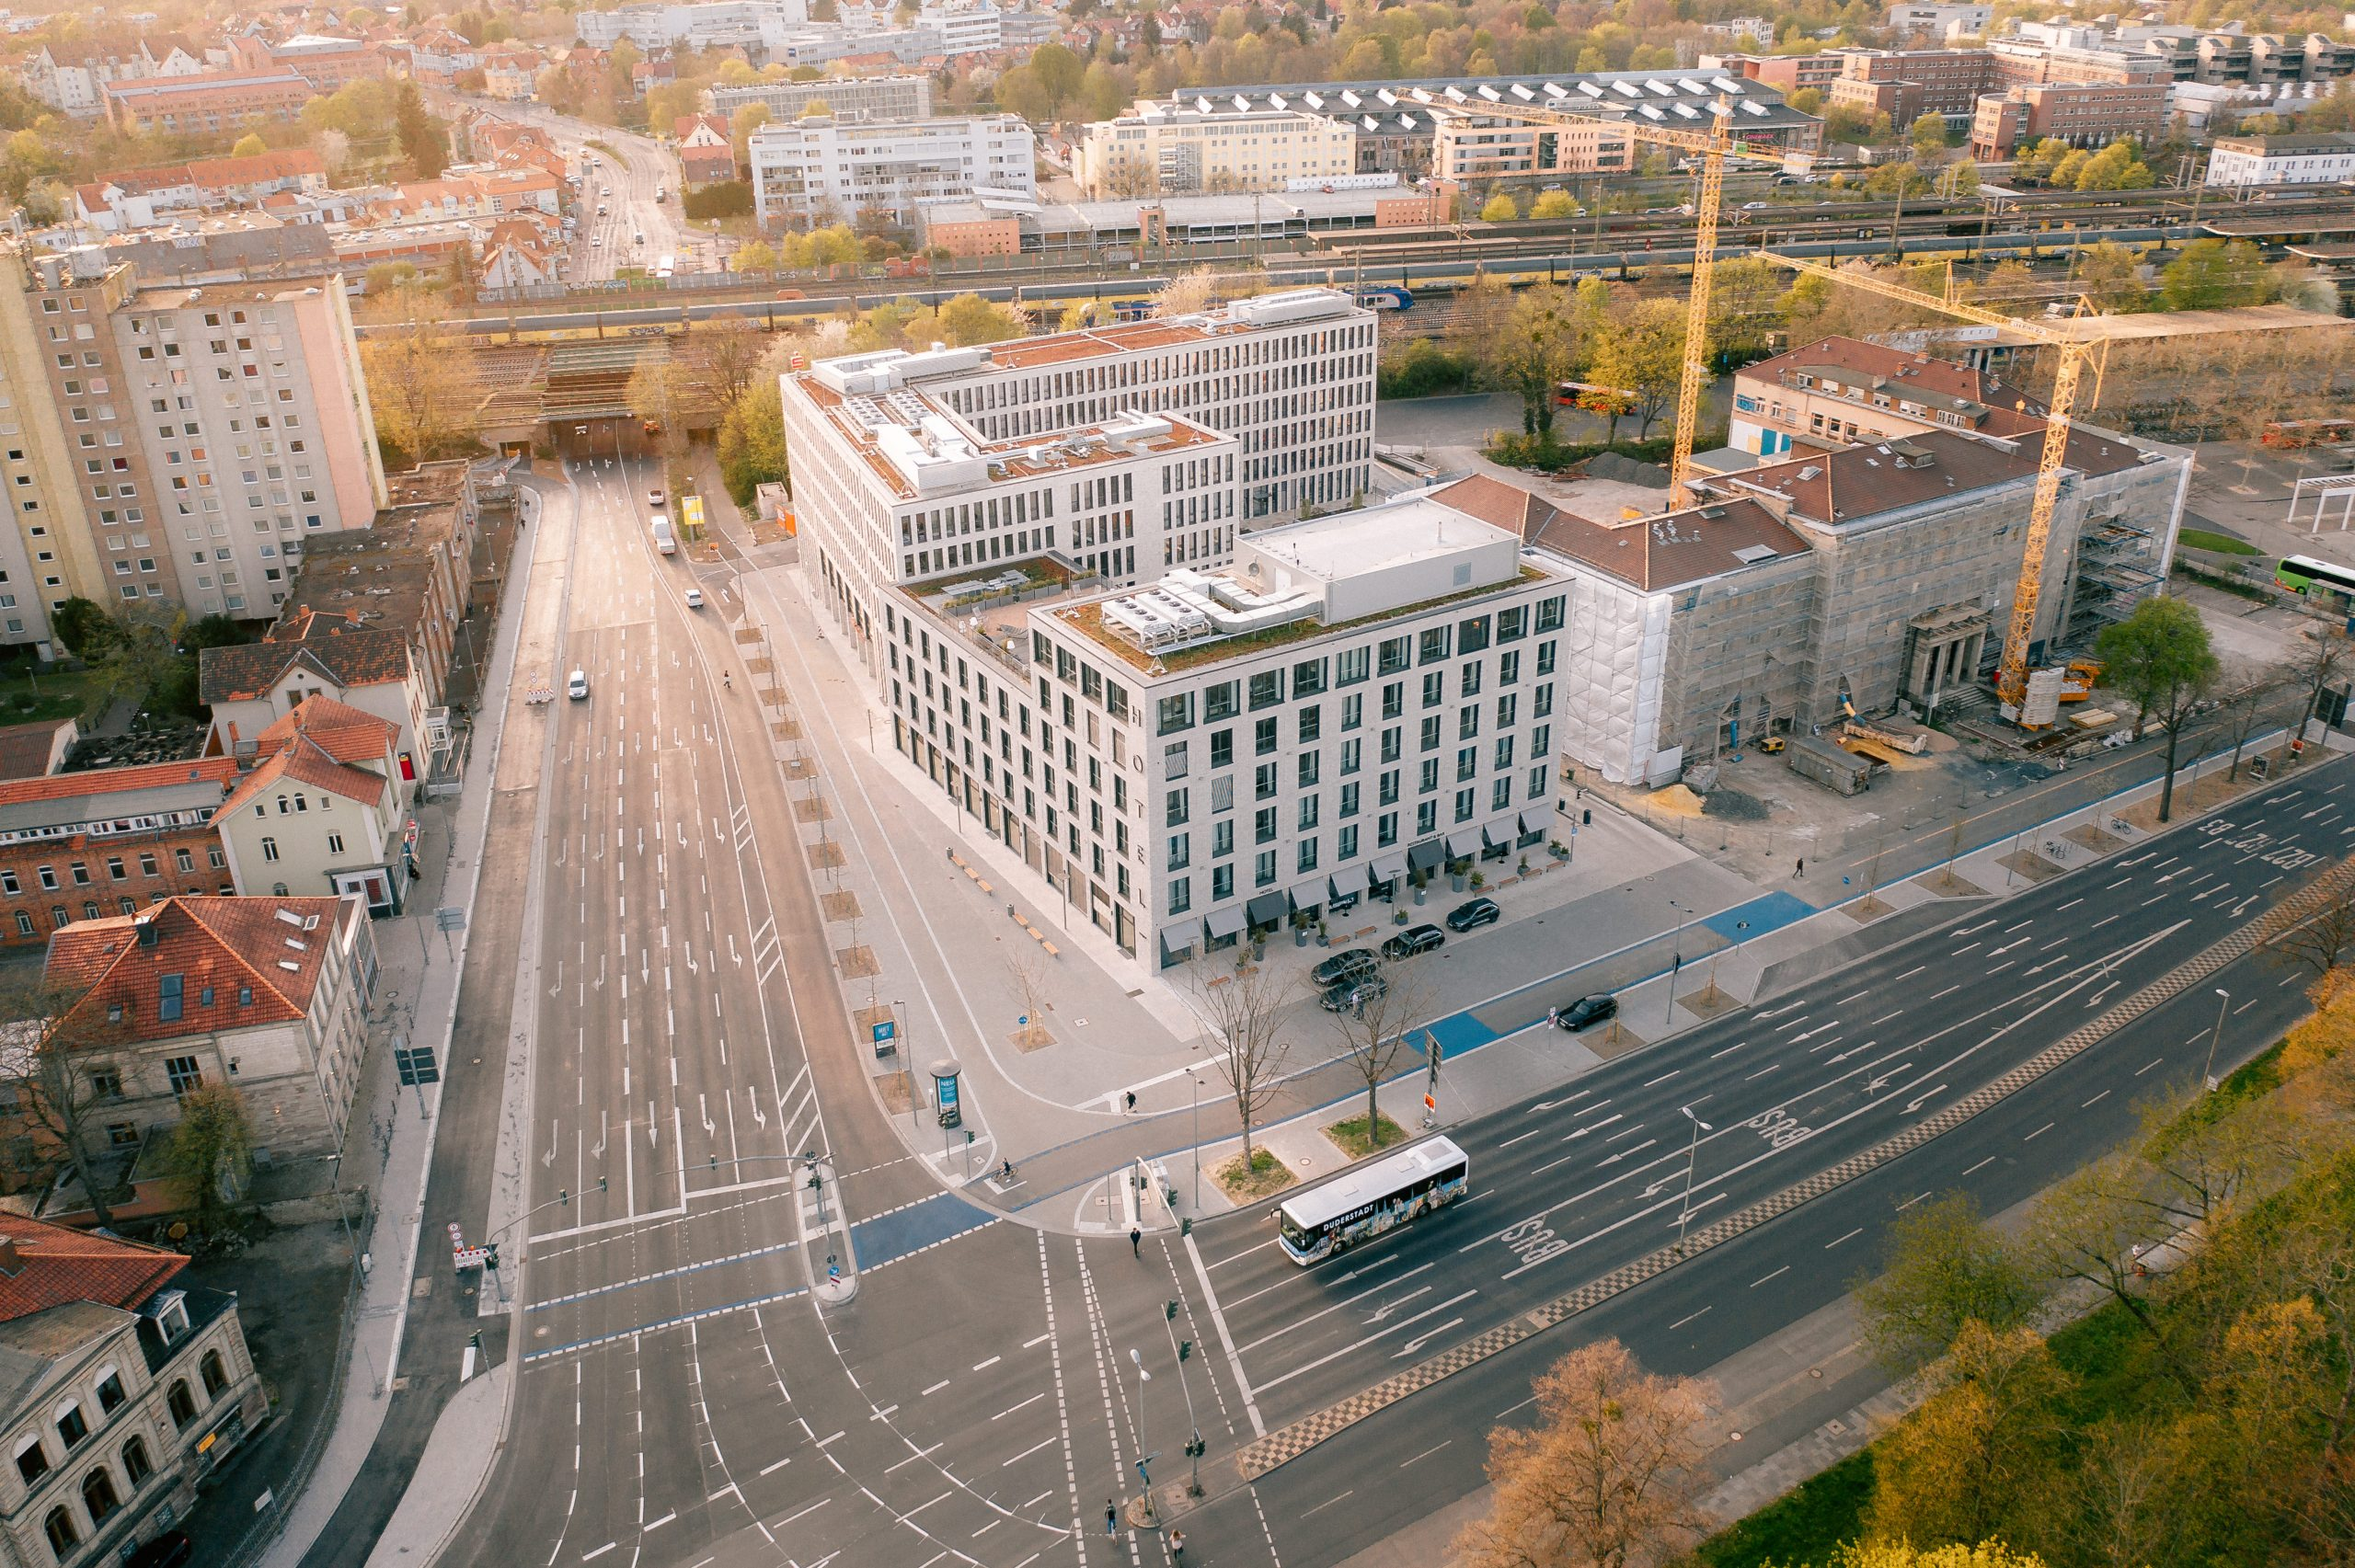 Luftbilder Berlin